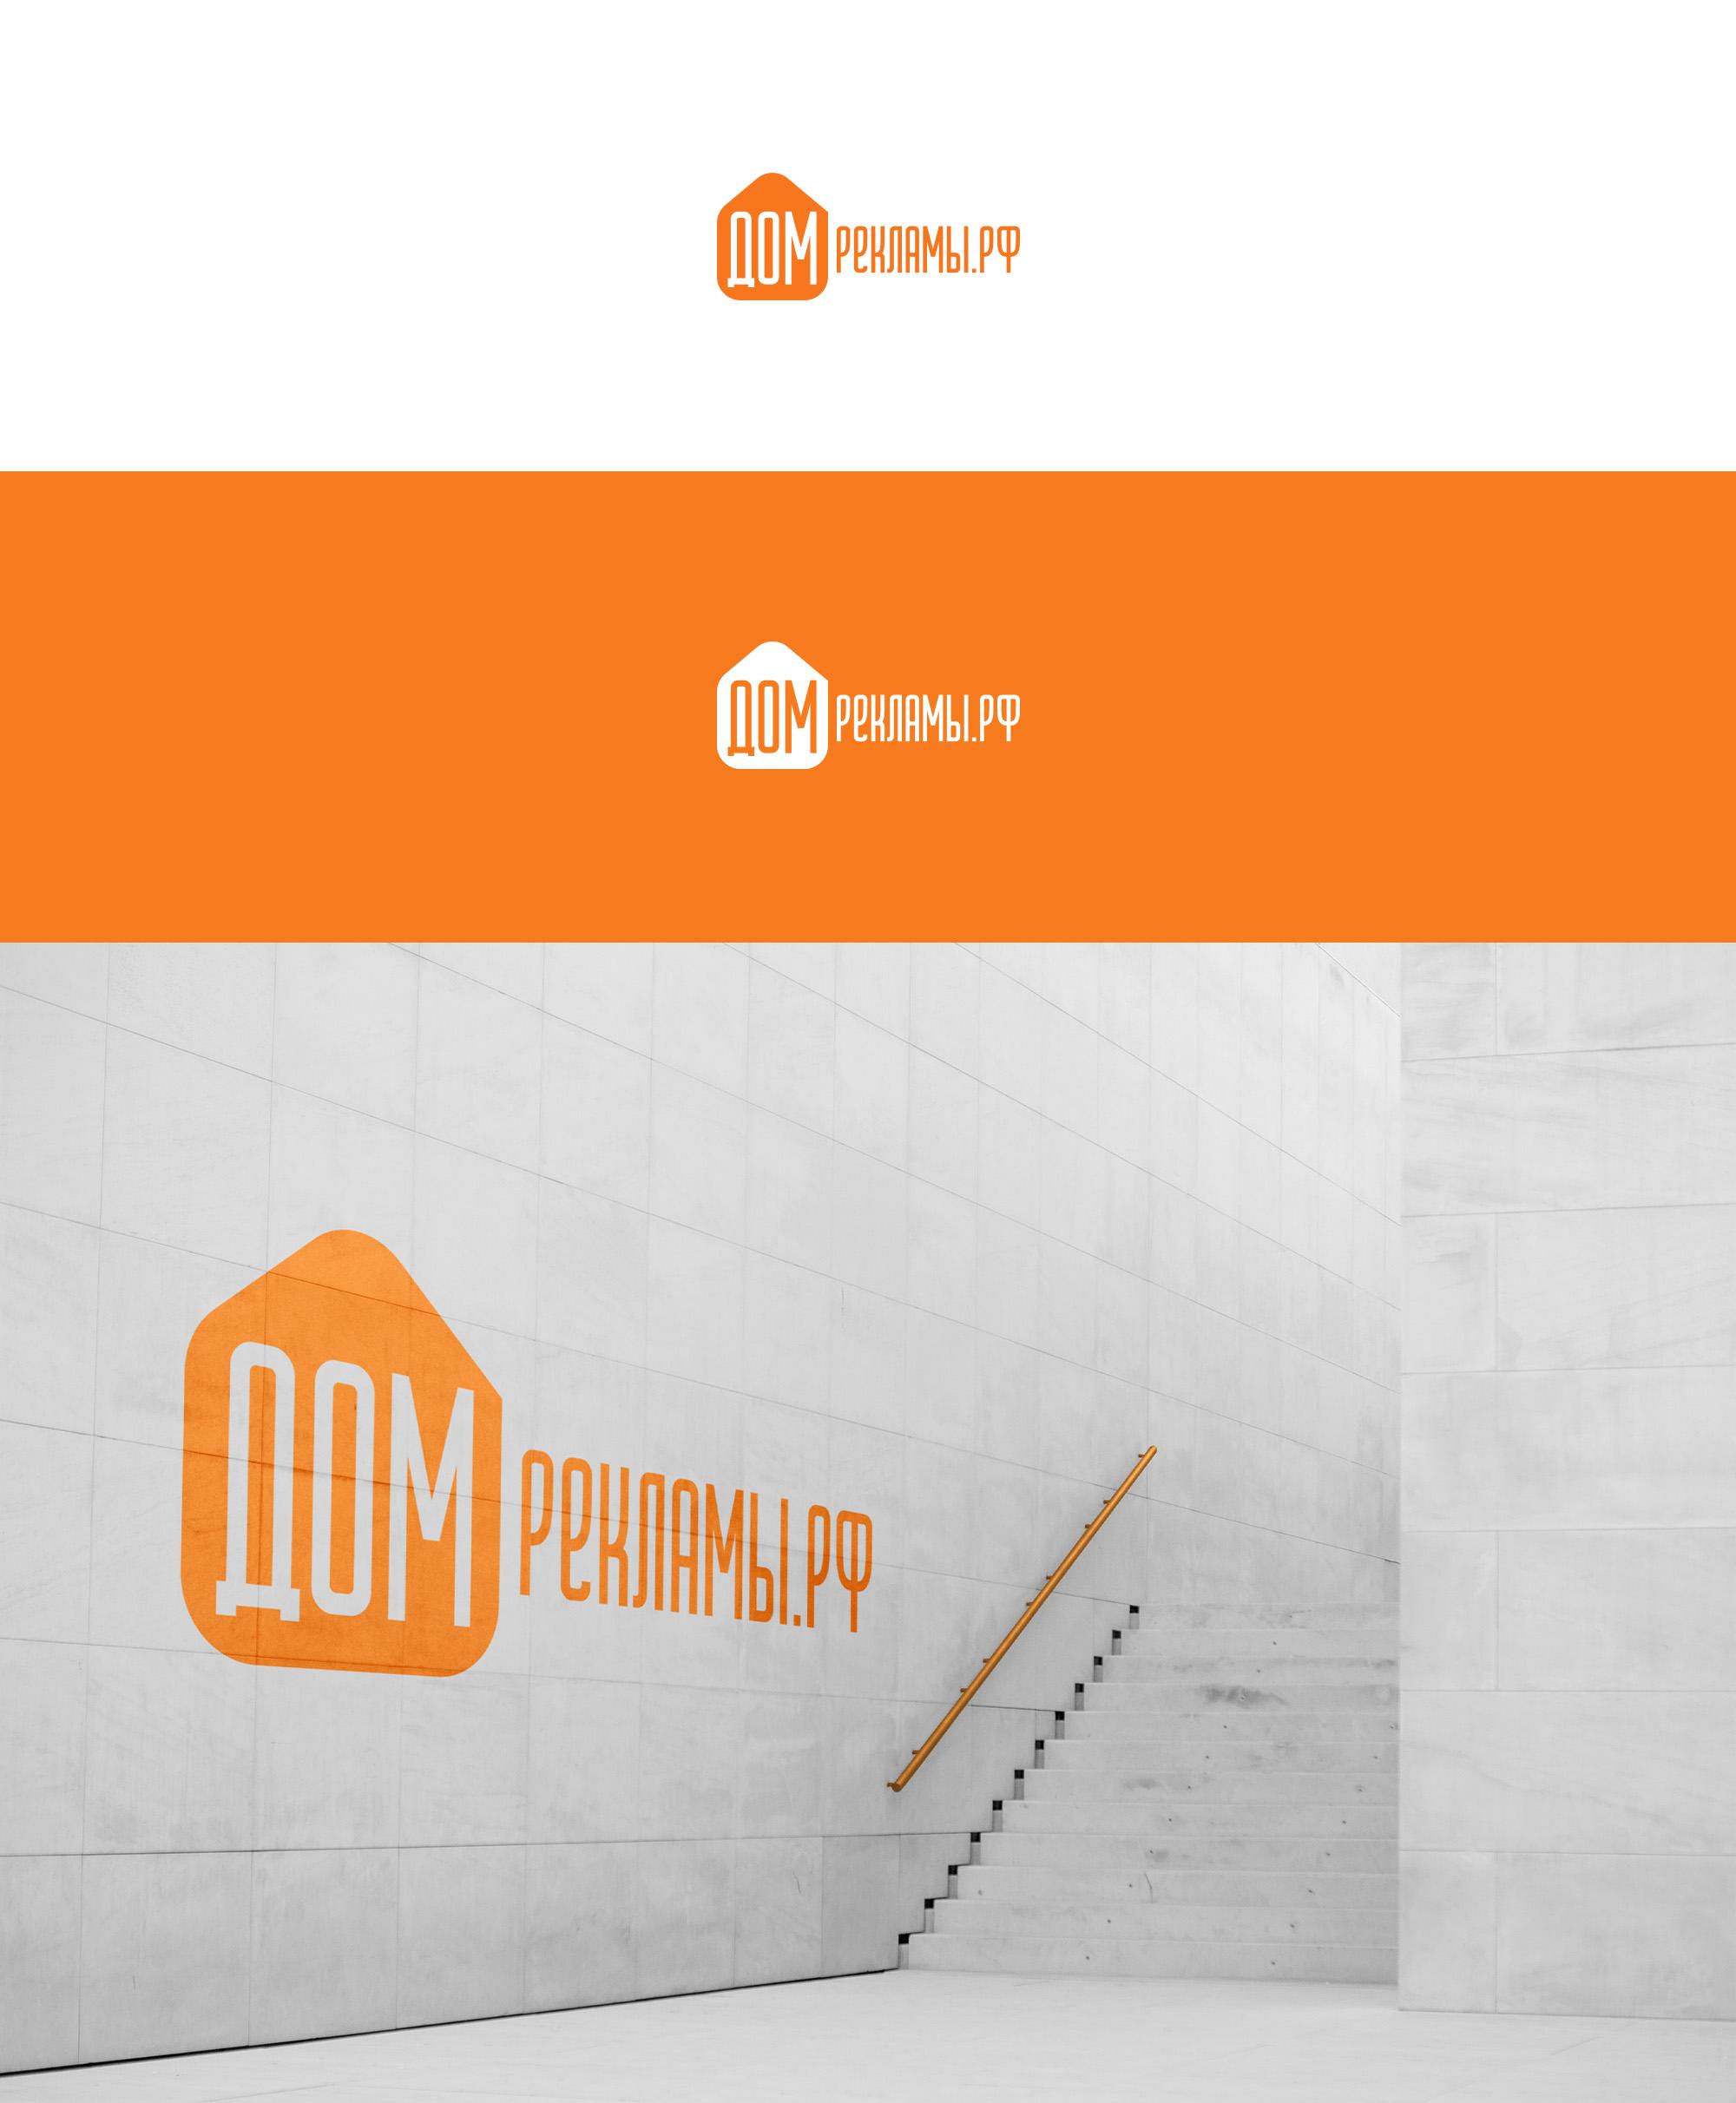 Дизайн логотипа рекламно-производственной компании фото f_2505edbe90fb87a1.jpg